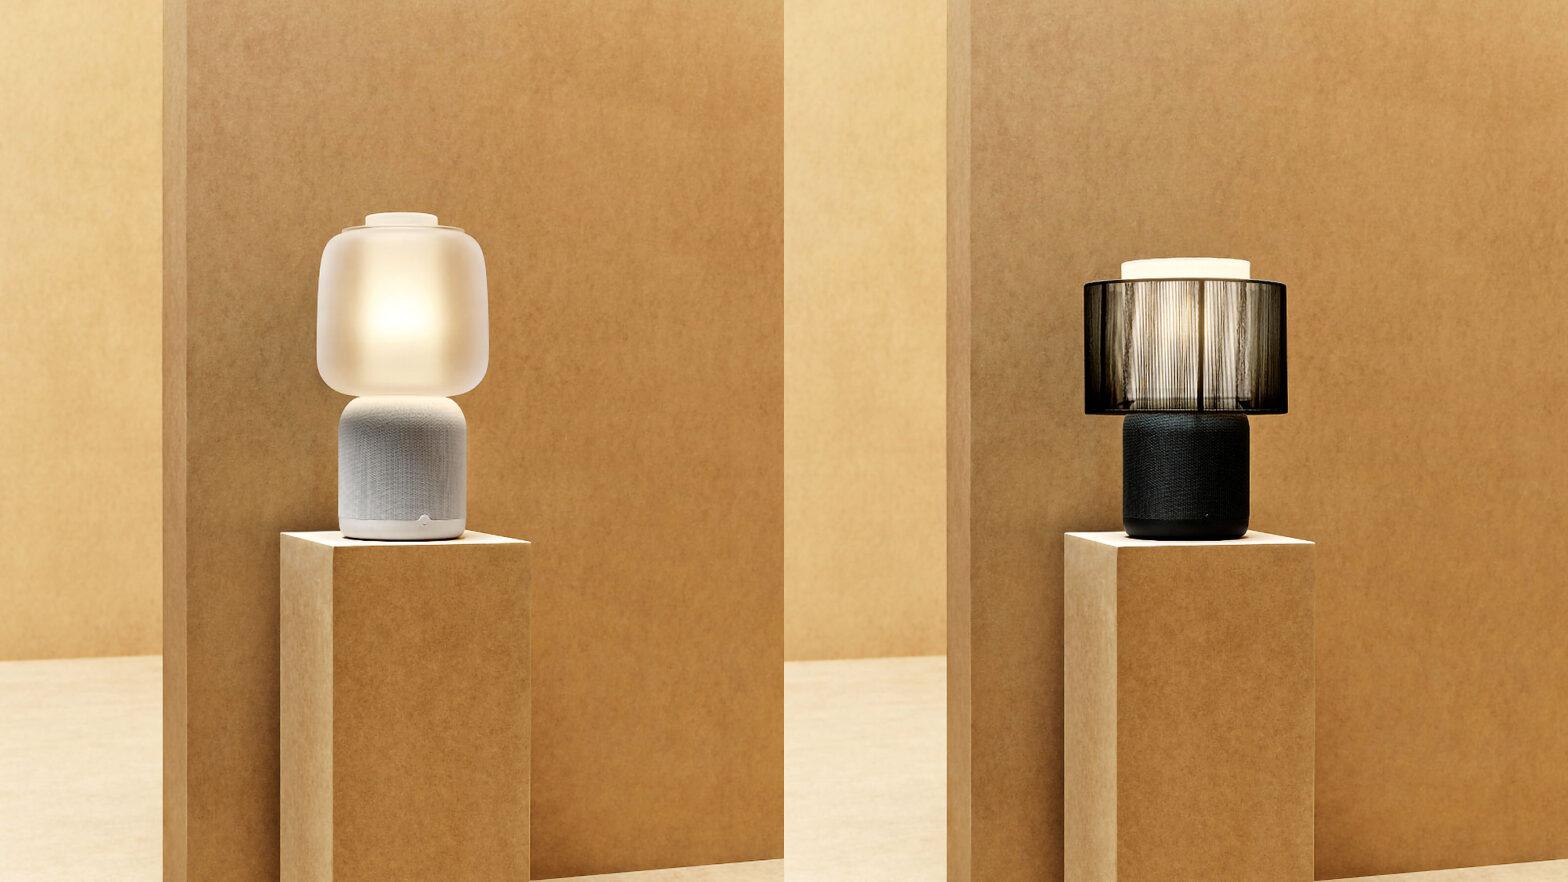 IKEA Sonos Speaker Lamp Symfonisk Gets Updated